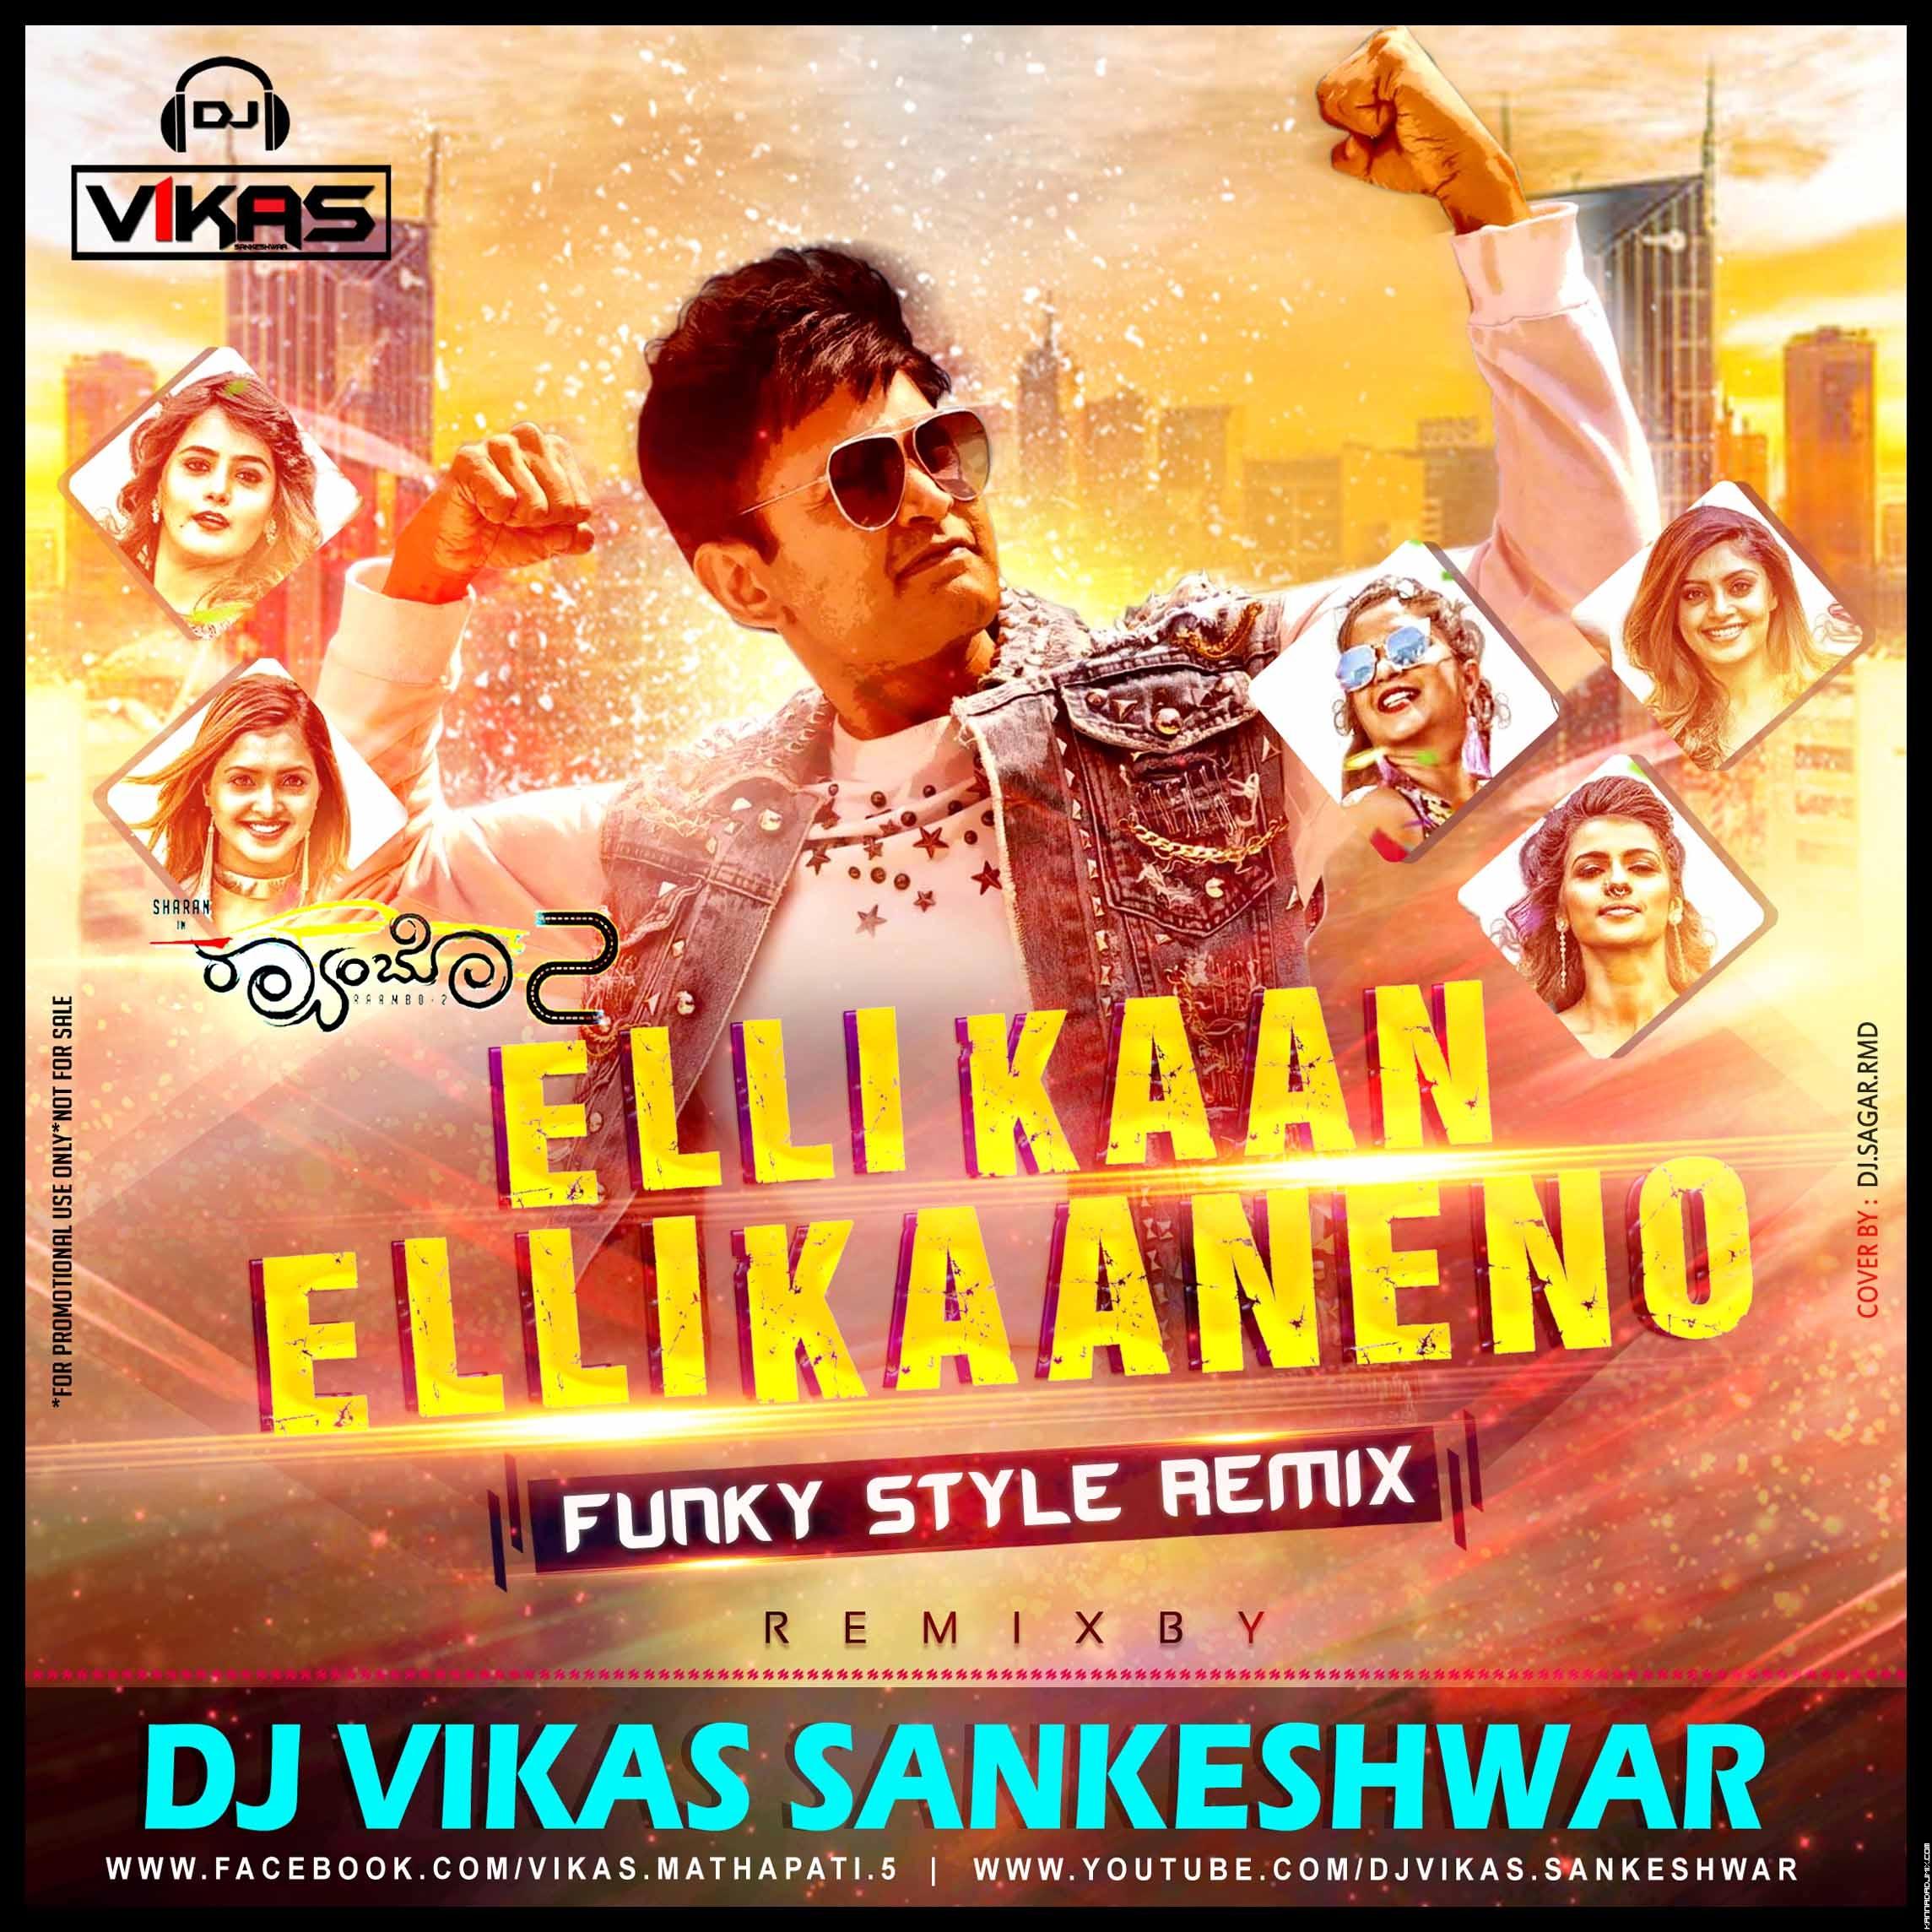 ElliKaan ElliKaaneno ( FuNkY ReMix) - DJ ViKaS Sankeshwar.mp3